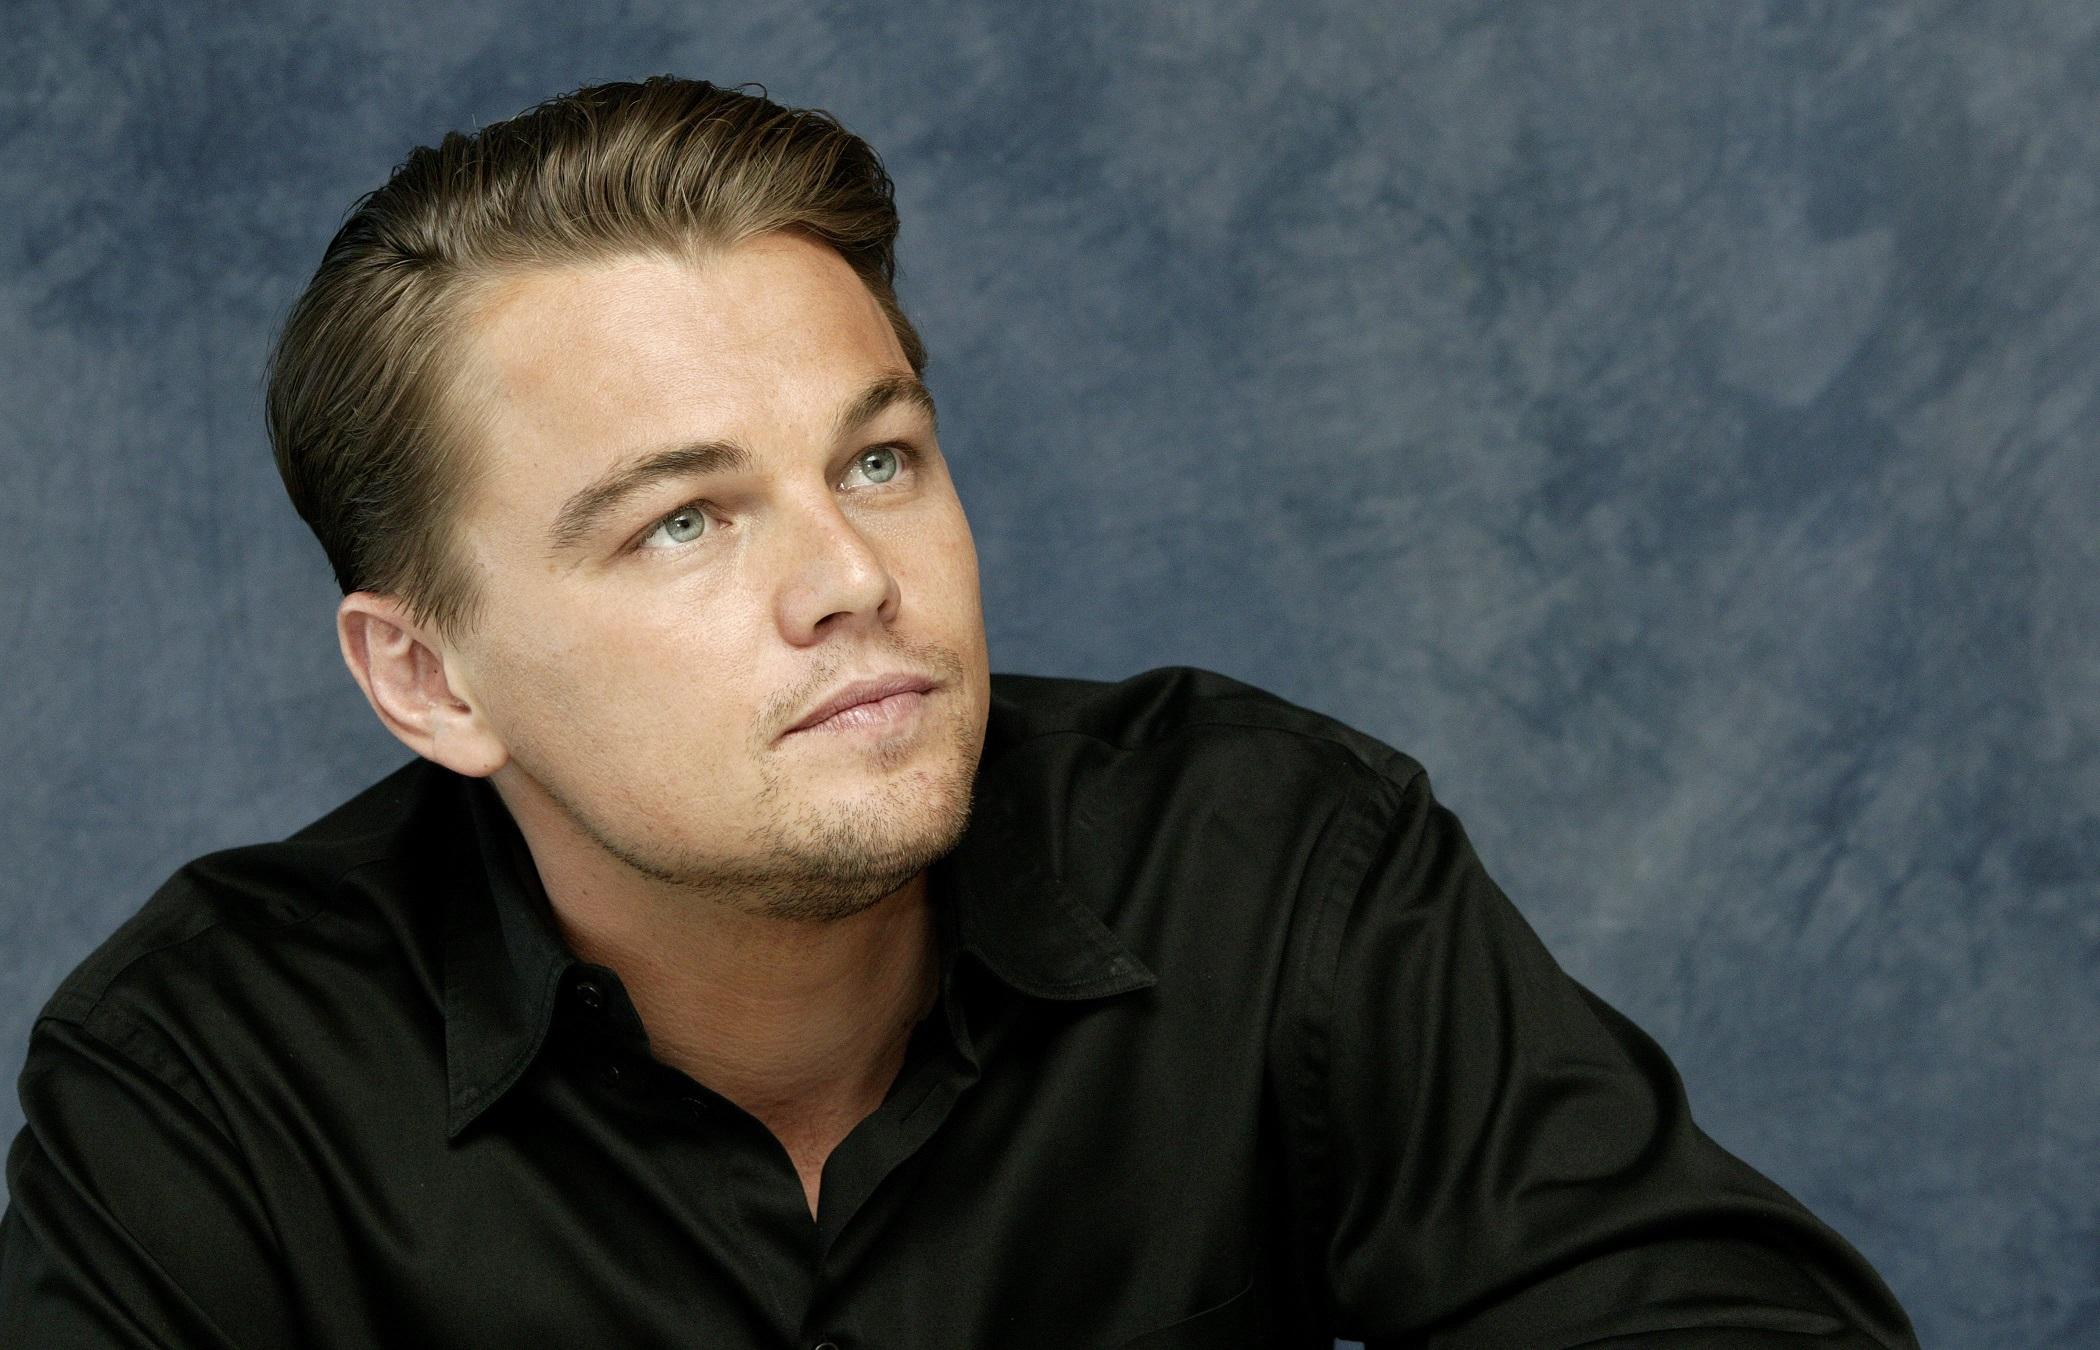 Leonardo DiCaprio Wallpaper 14